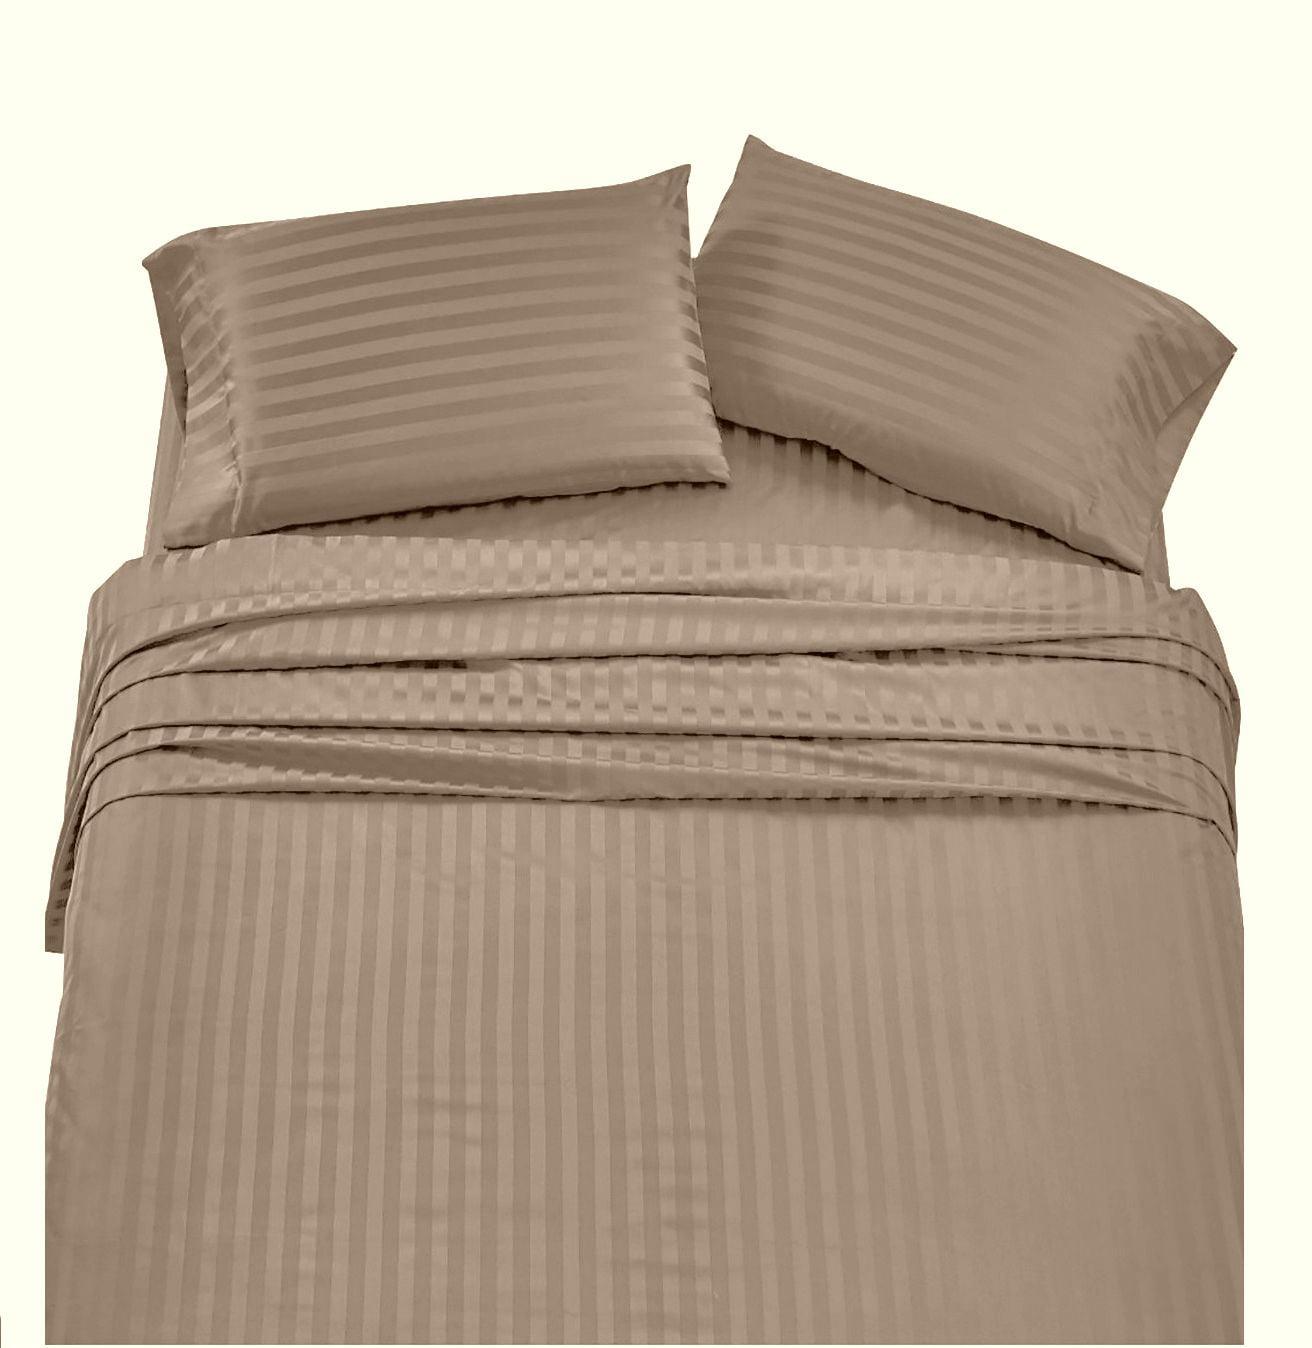 Bed Sheet Set Black Stripe RV Camper /& BUNK Bed All Sizes 1000 Thread Count